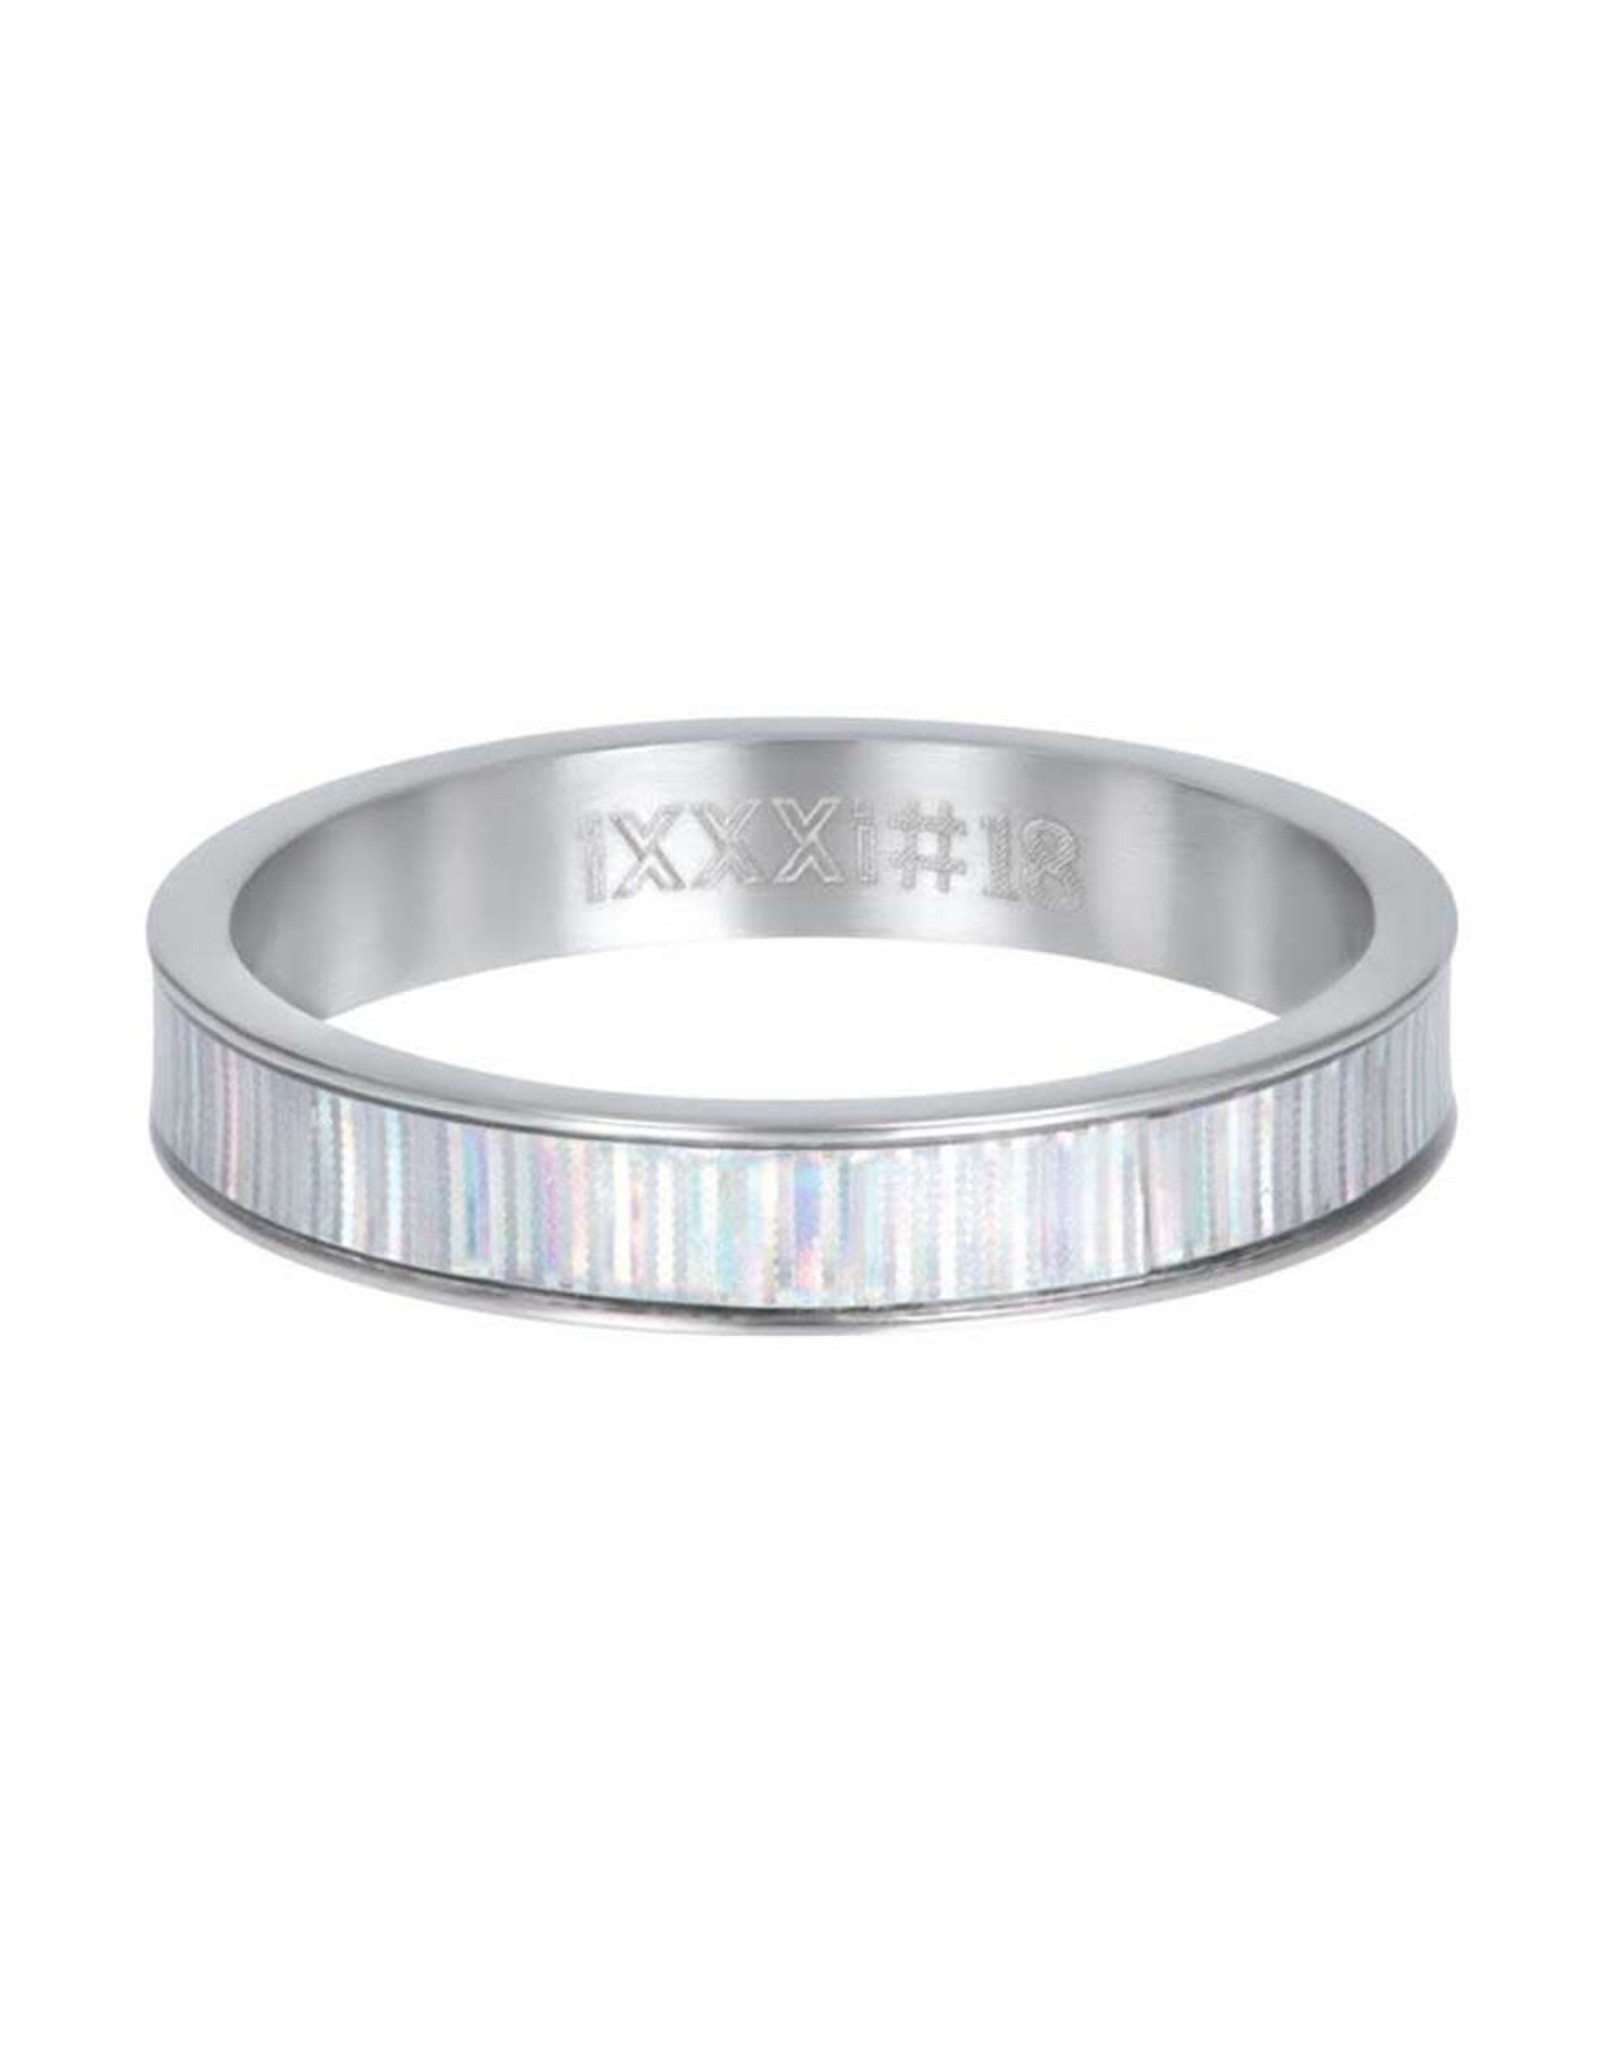 iXXXi Jewelry iXXXi vulring Frozen